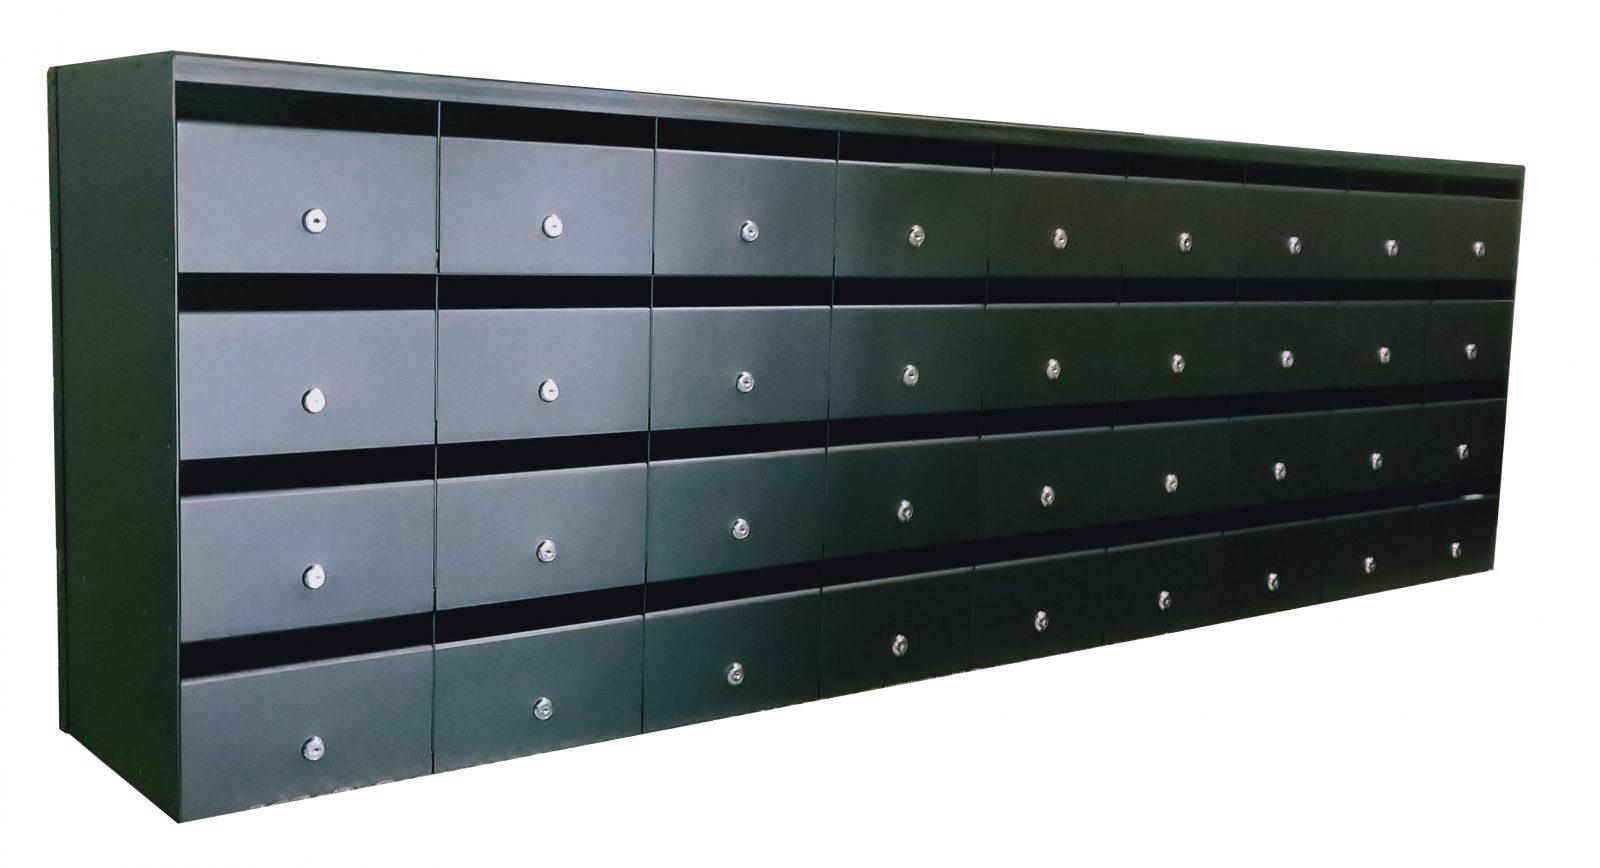 Letterbox Flat Panel Doors